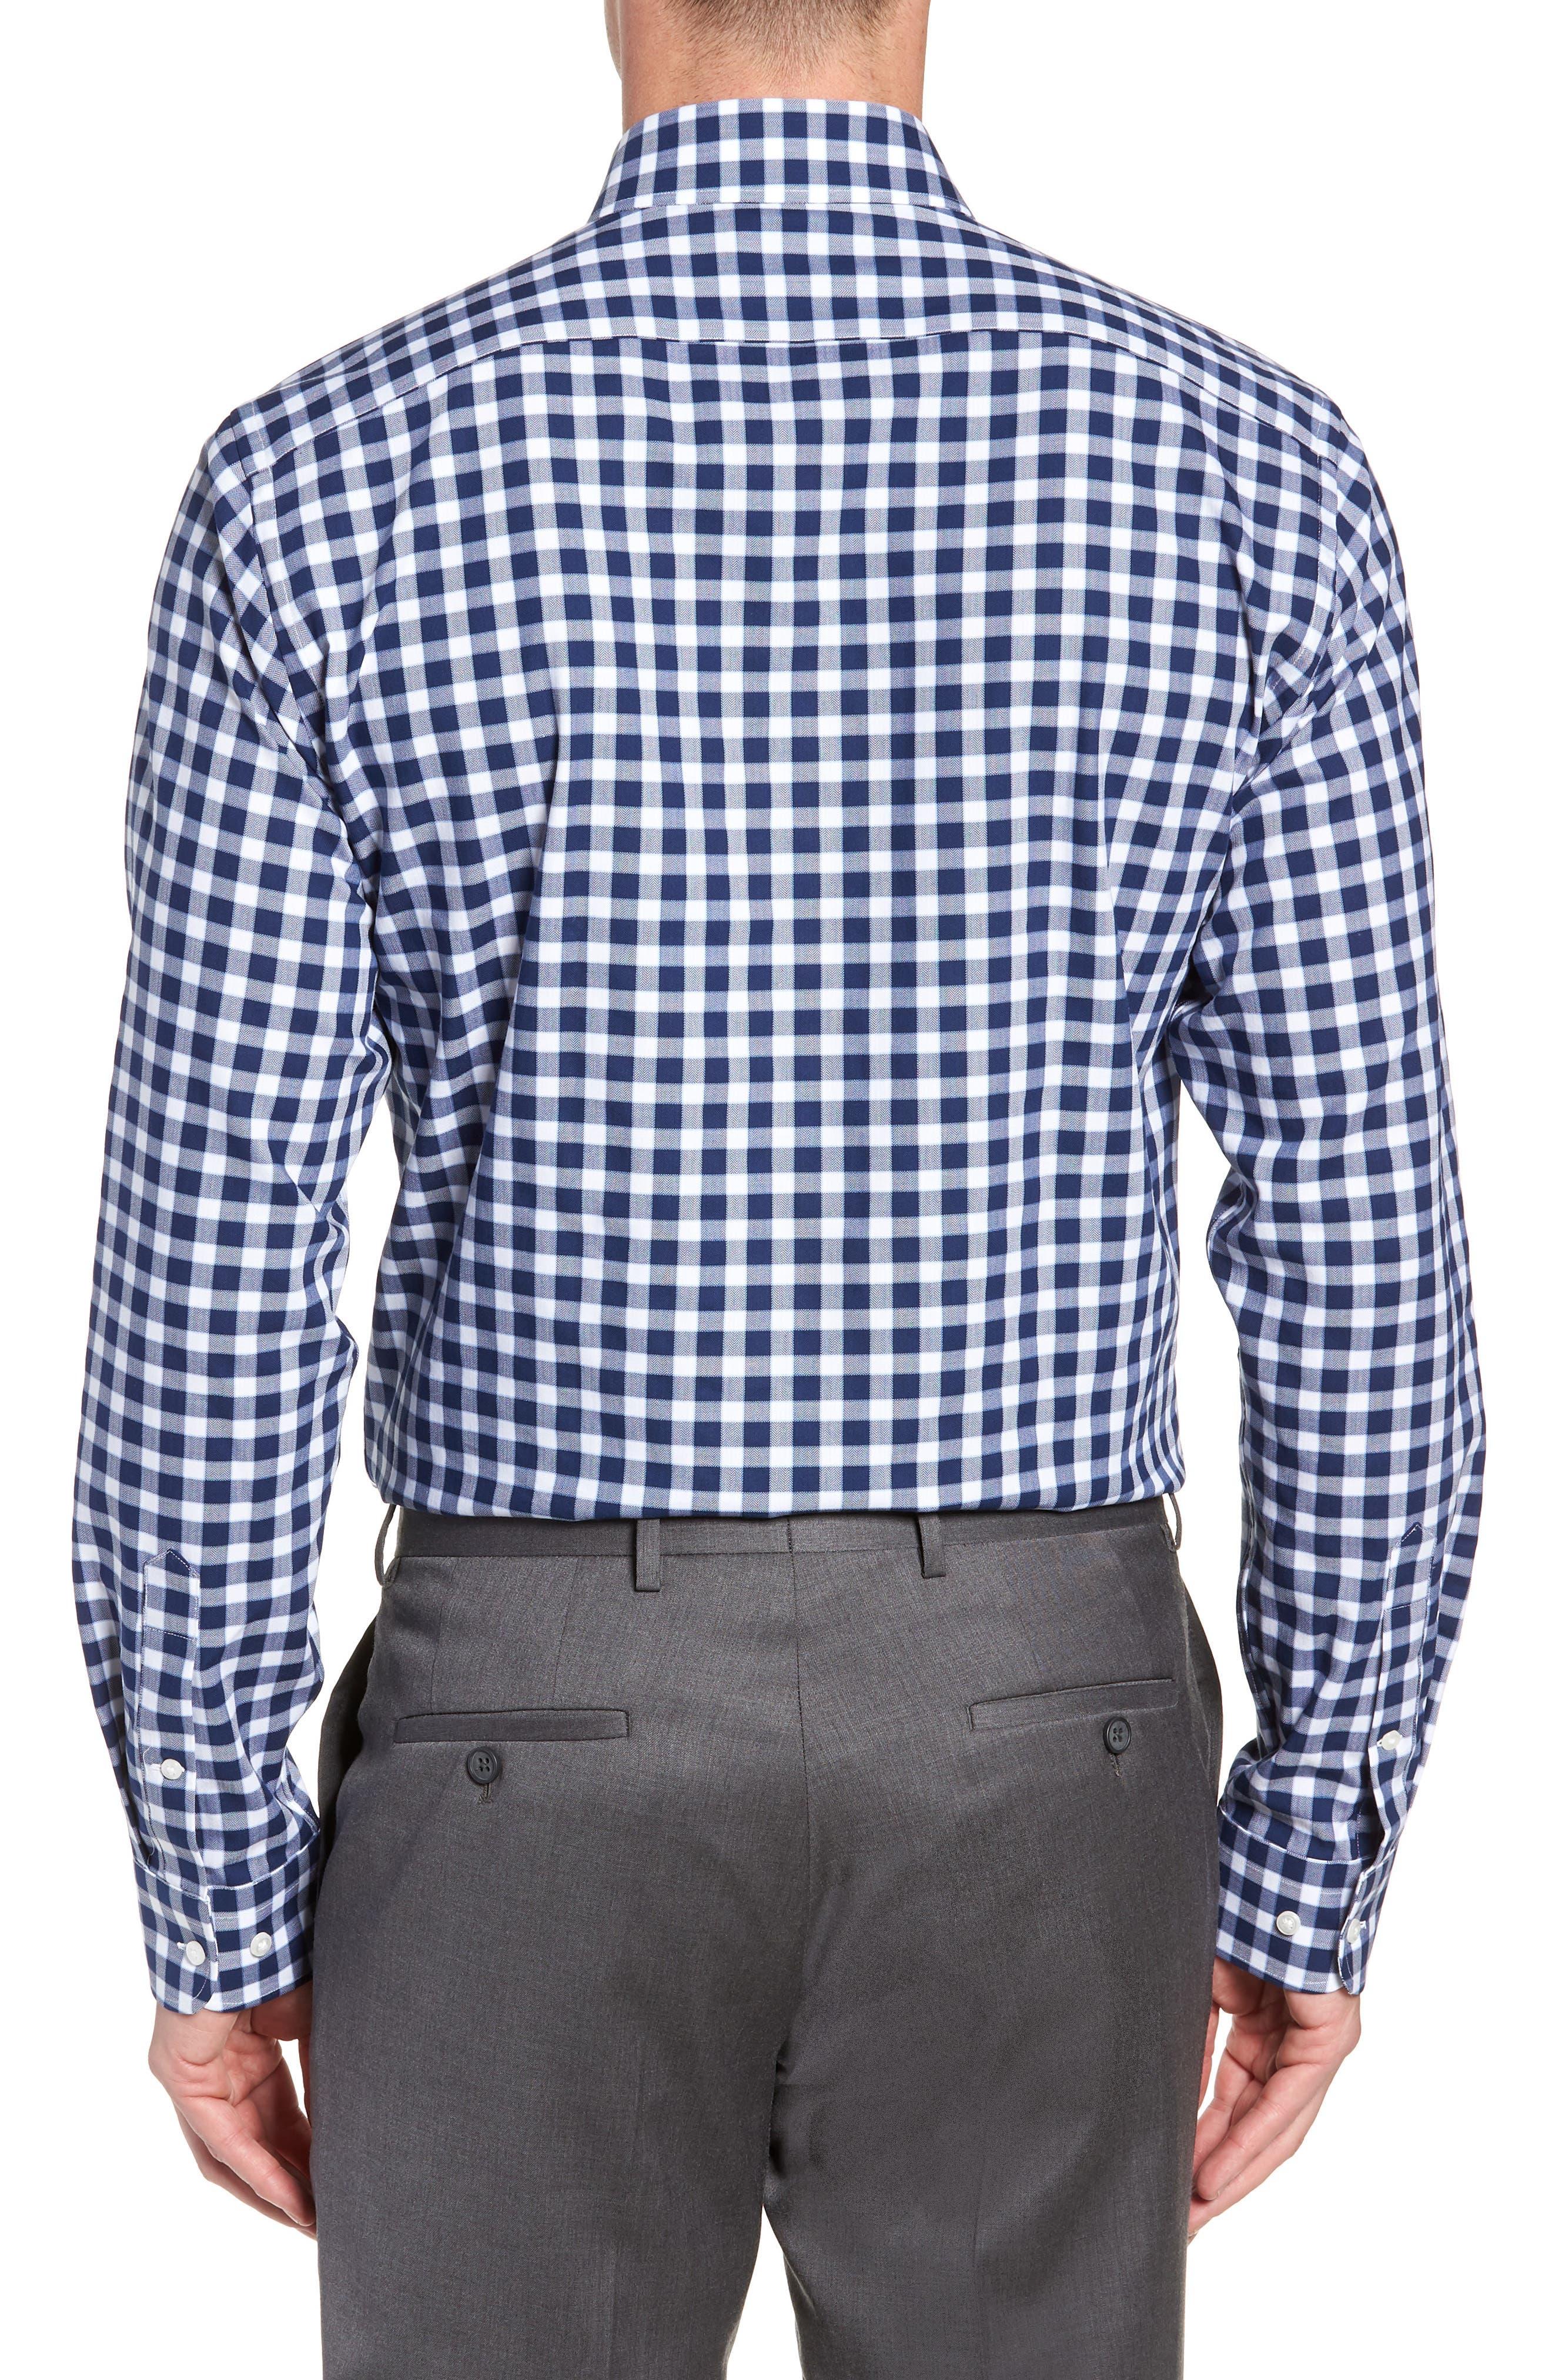 Tech-Smart Trim Fit Stretch Check Dress Shirt,                             Alternate thumbnail 3, color,                             NAVY PEACOAT